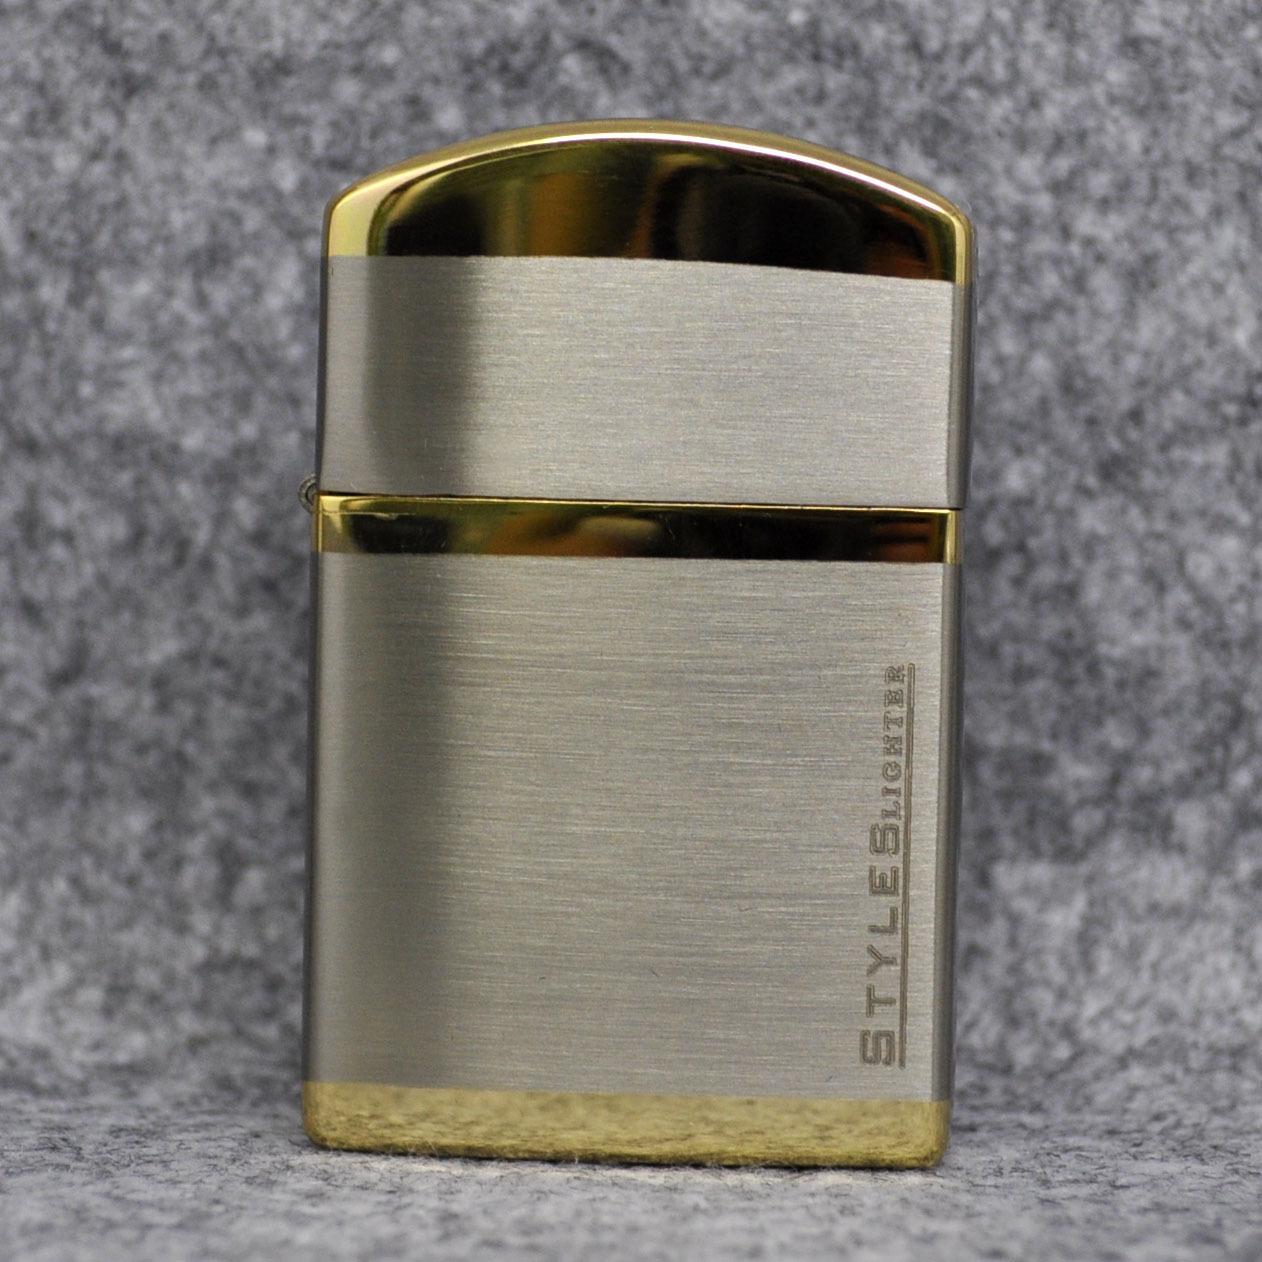 Spk Styles/ ST5290 exeq spk 1103 silver портативная ас